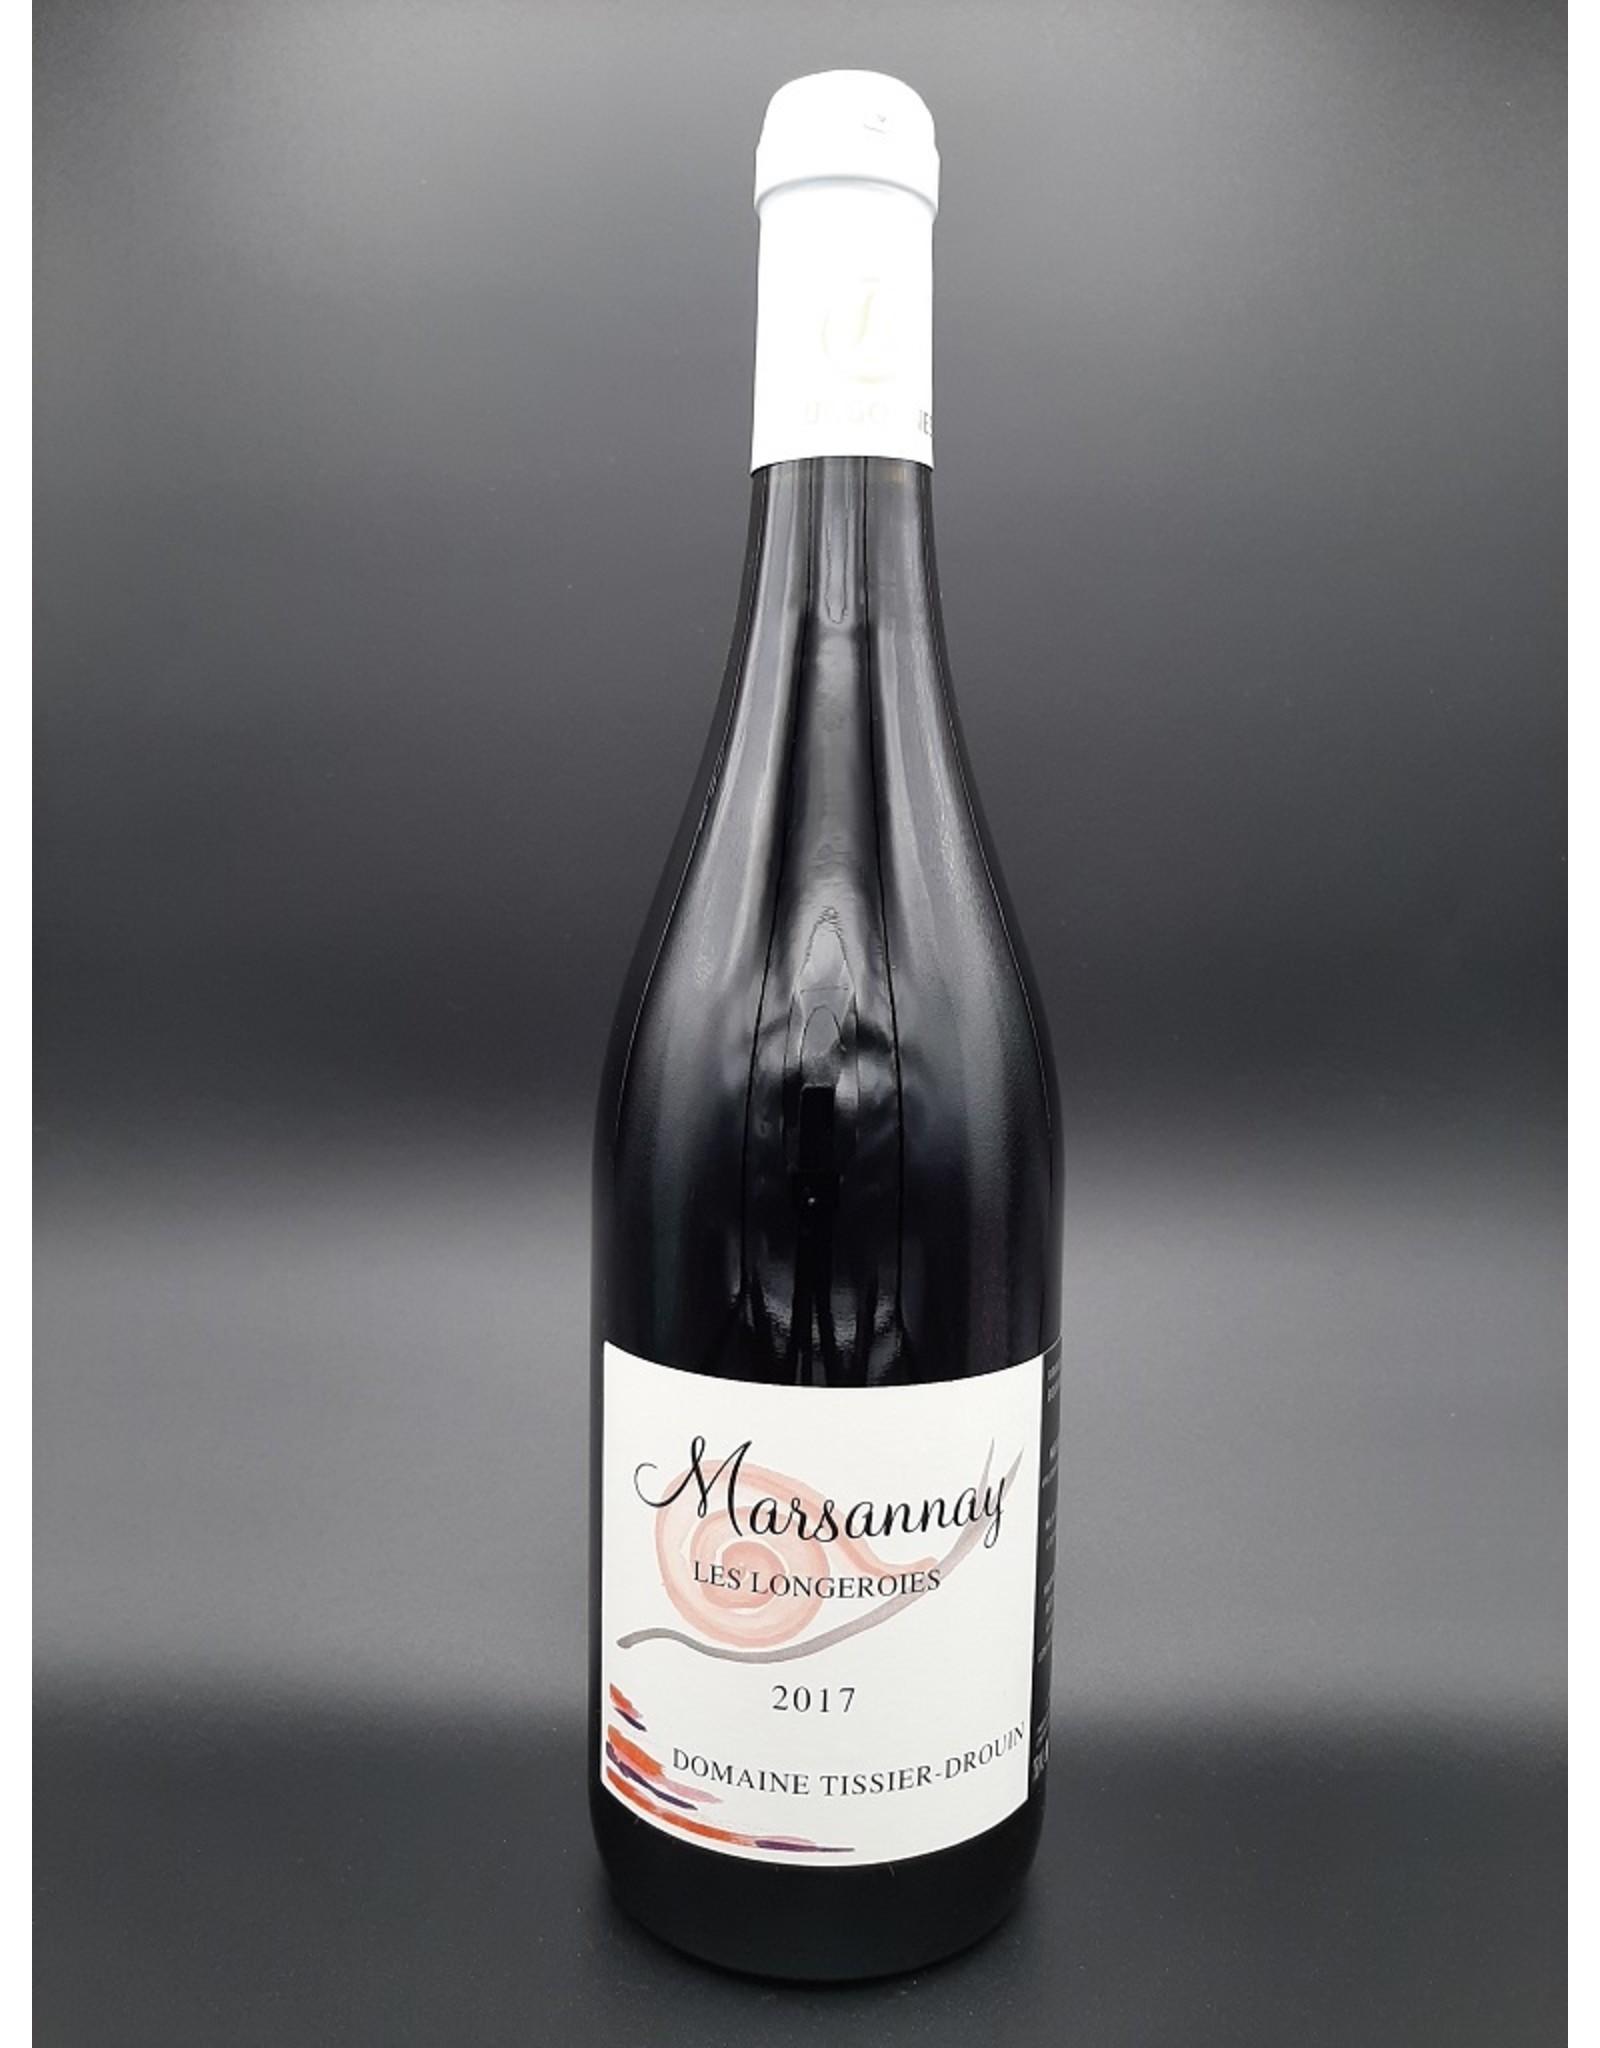 Domaine Tissier Drouin Marsannay Longeroies rouge 2017